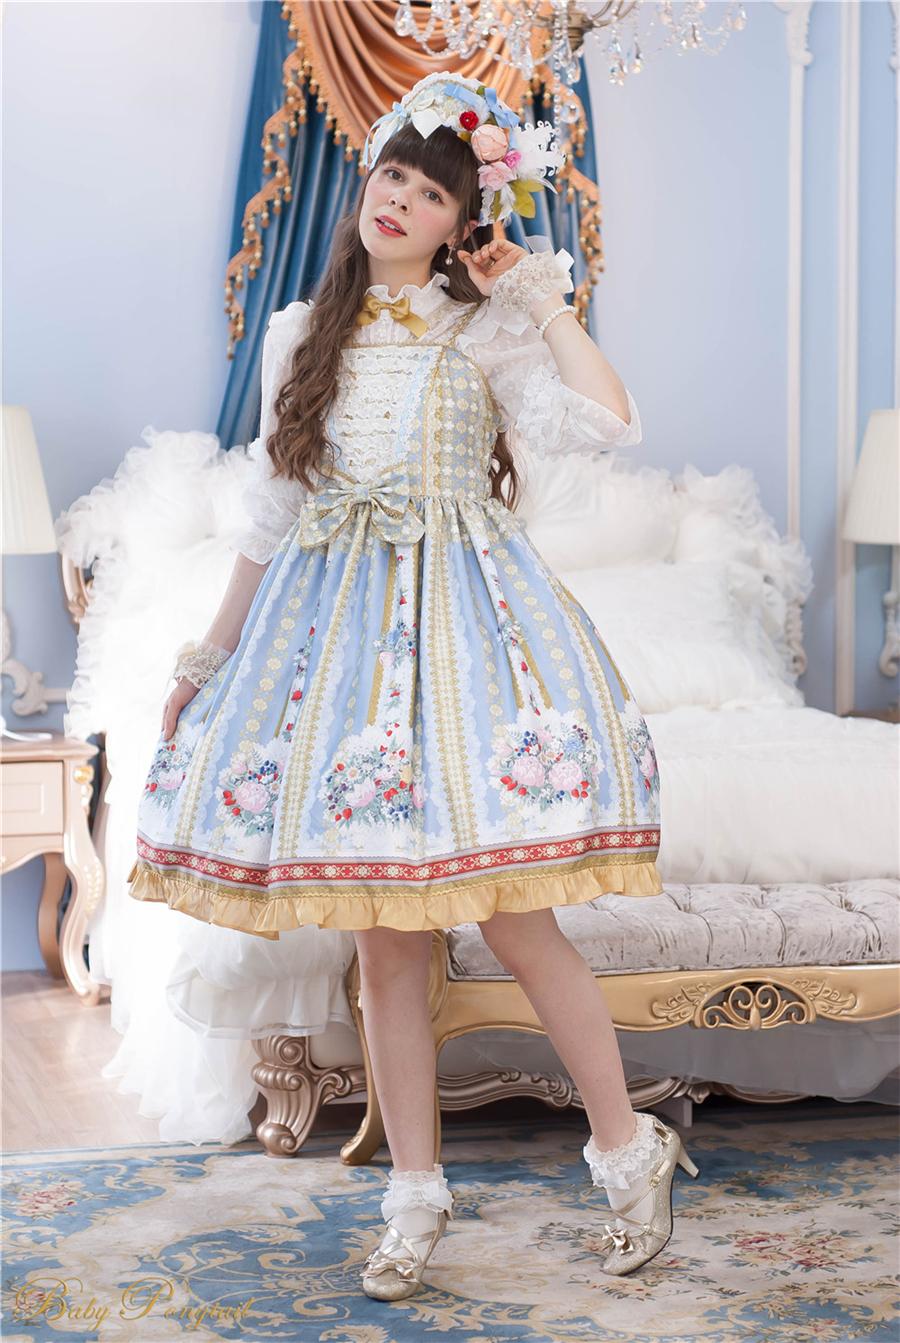 Baby Ponytail_Model Photo_Polly's Garden of Dreams_JSK Blue_Claudia_3.jpg